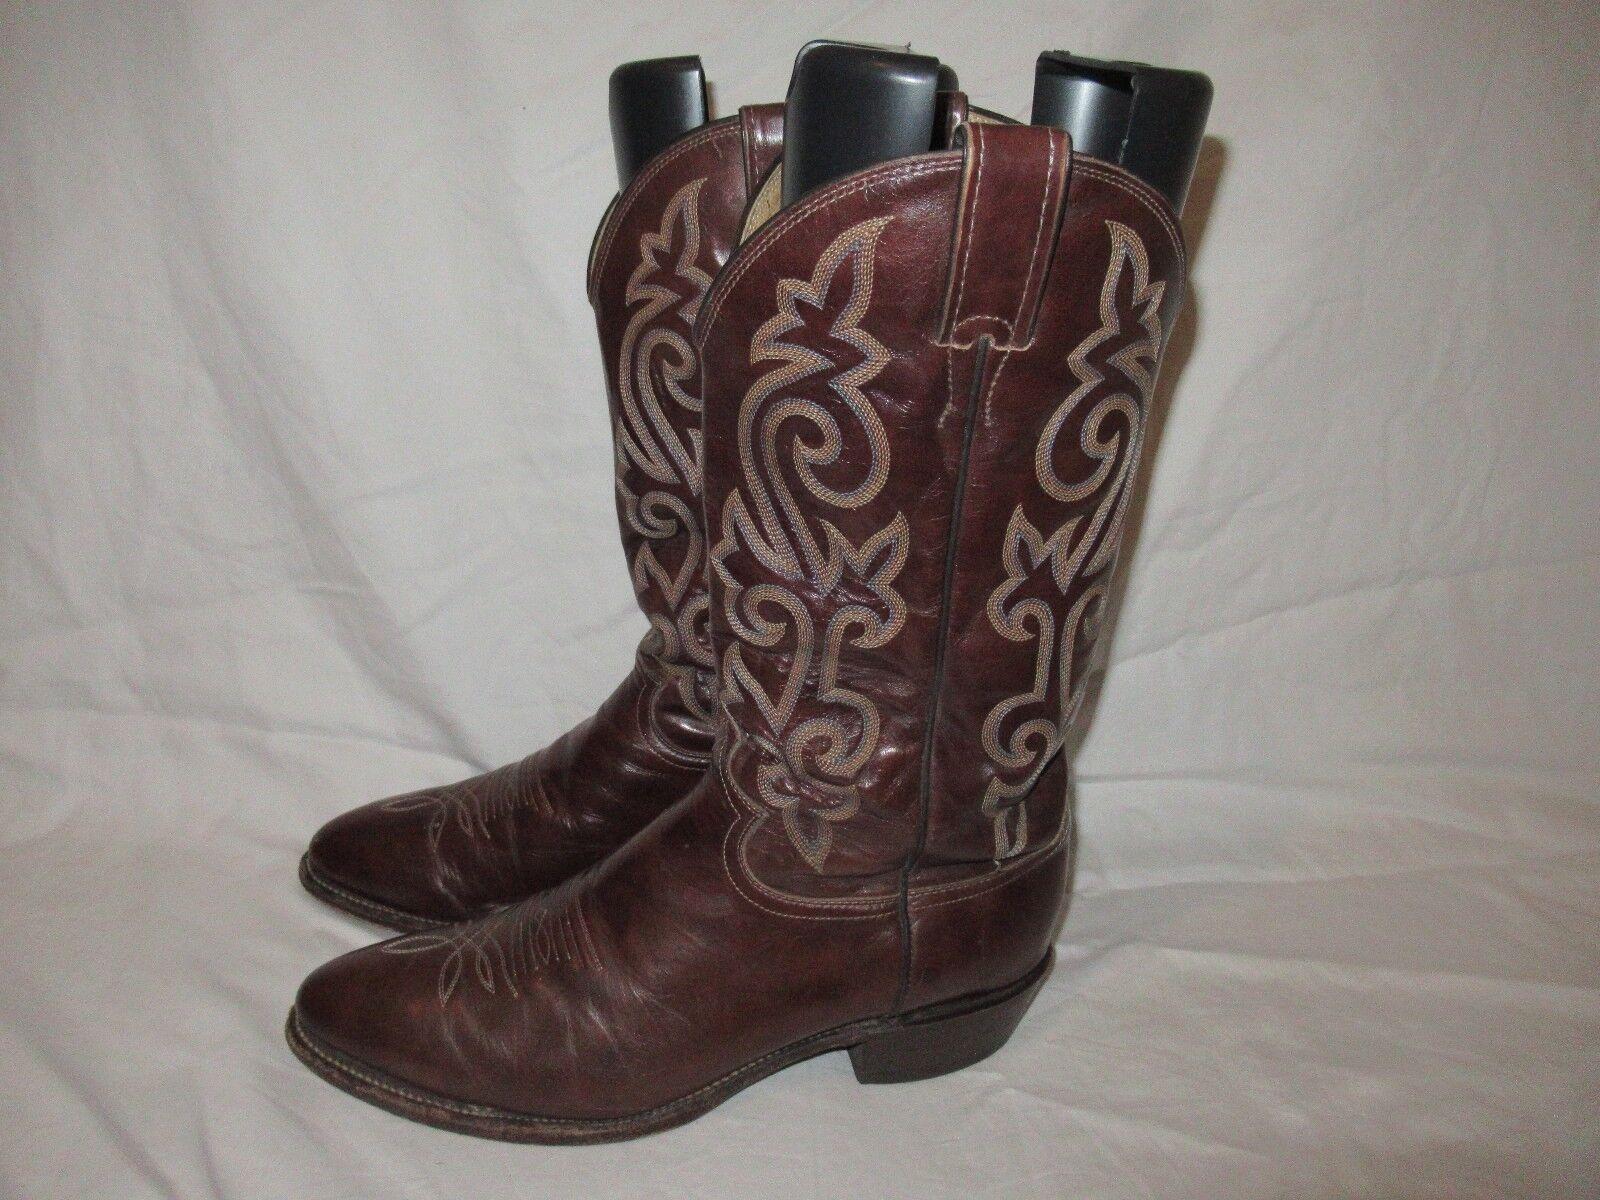 Uomo Justin Western Cowboy riding Stivali Size 10.5 D Style Style Style J1487 Pelle  A e20799